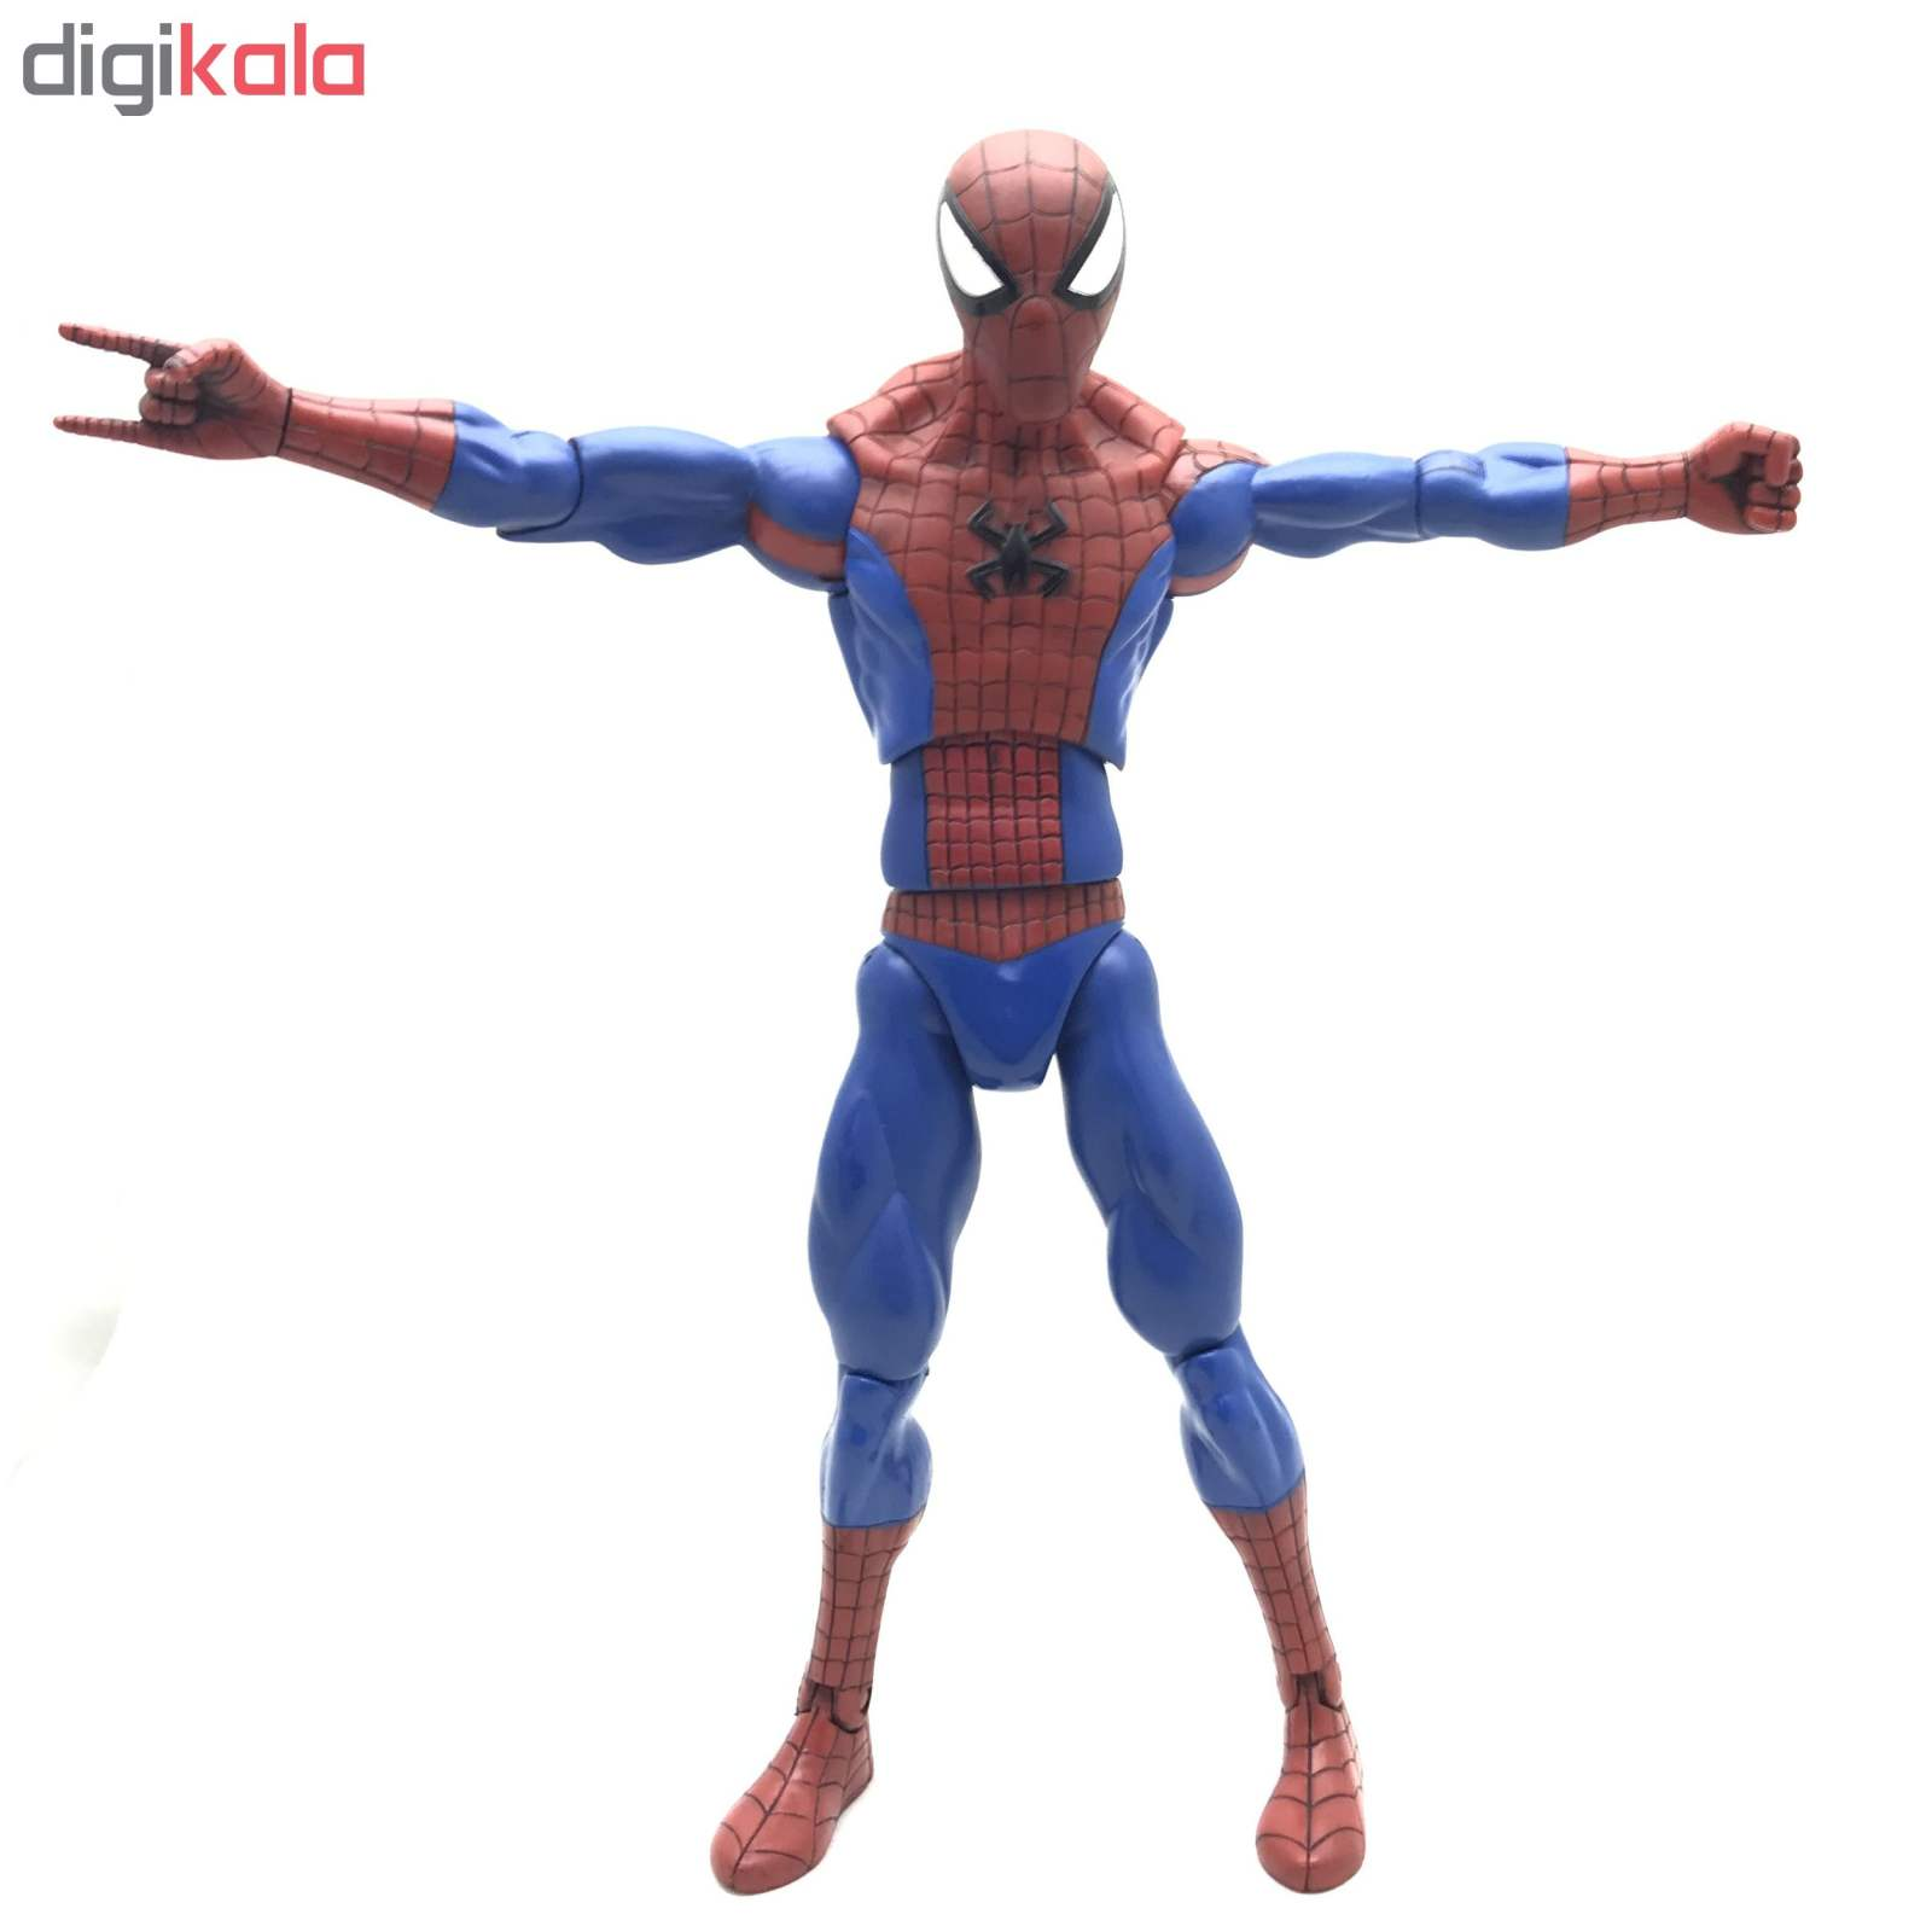 اکشن فیگور طرح Spider Man